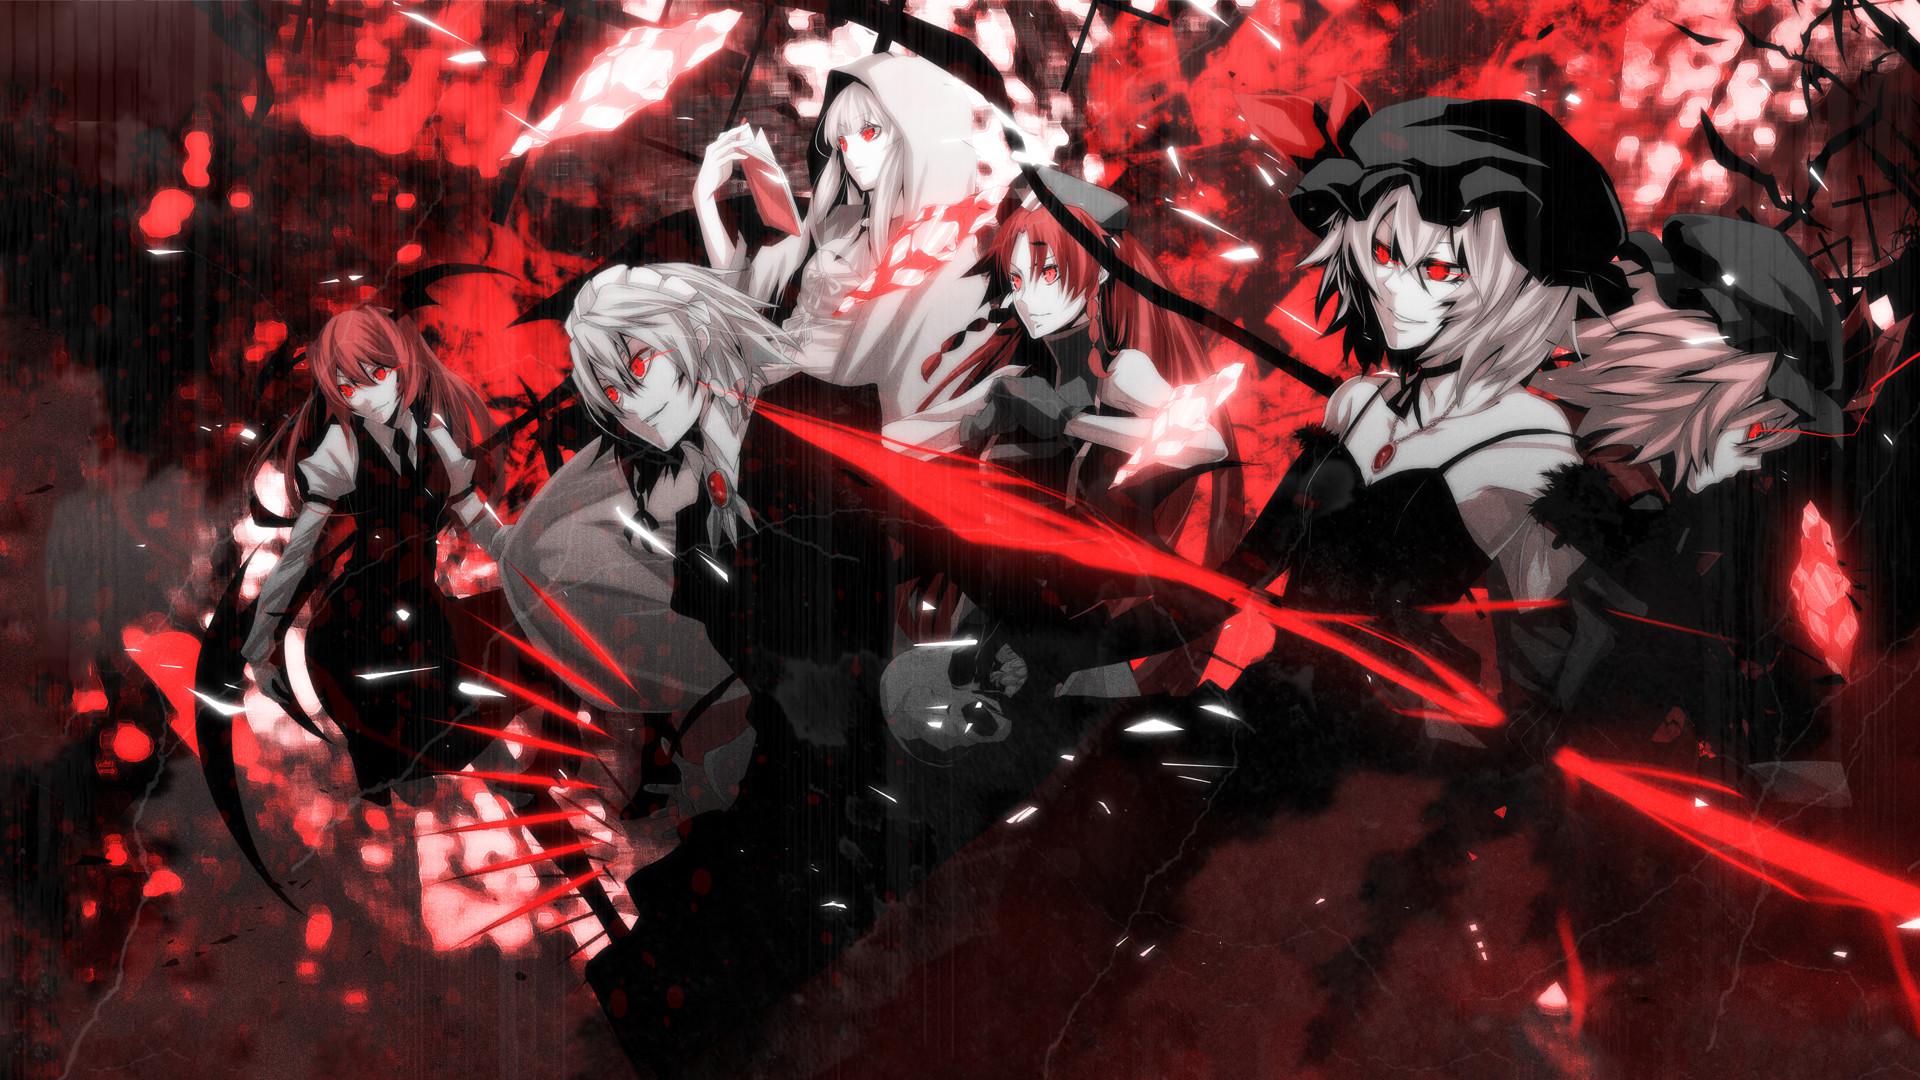 Anime – Touhou Hong Meiling Patchouli Knowledge Sakuya Izayoi Flandre  Scarlet Remilia Scarlet Wallpaper